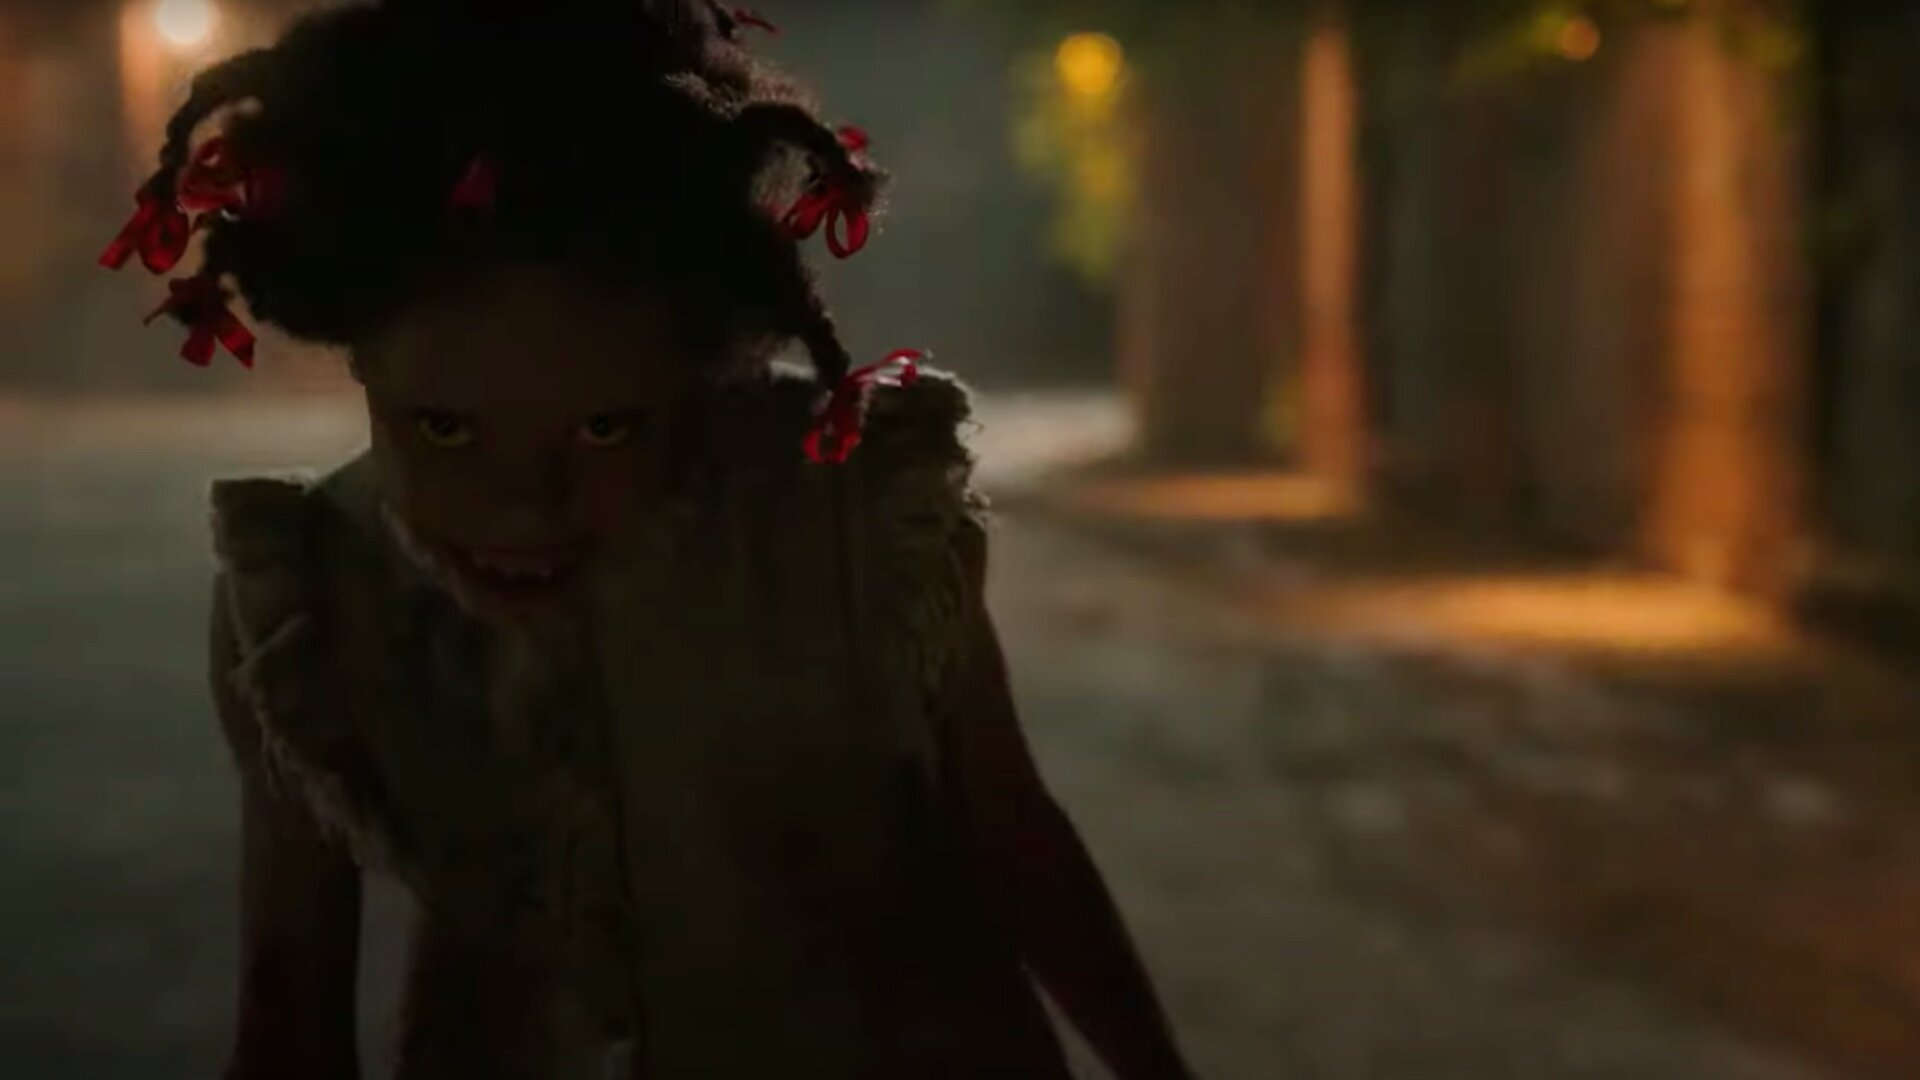 Great Trailer For J J Abrams And Jordan Peele S Hbo Horror Drama Series Lovecraft Country Geektyrant Jordan peele, yann demange, daniel sackheim and others. great trailer for j j abrams and